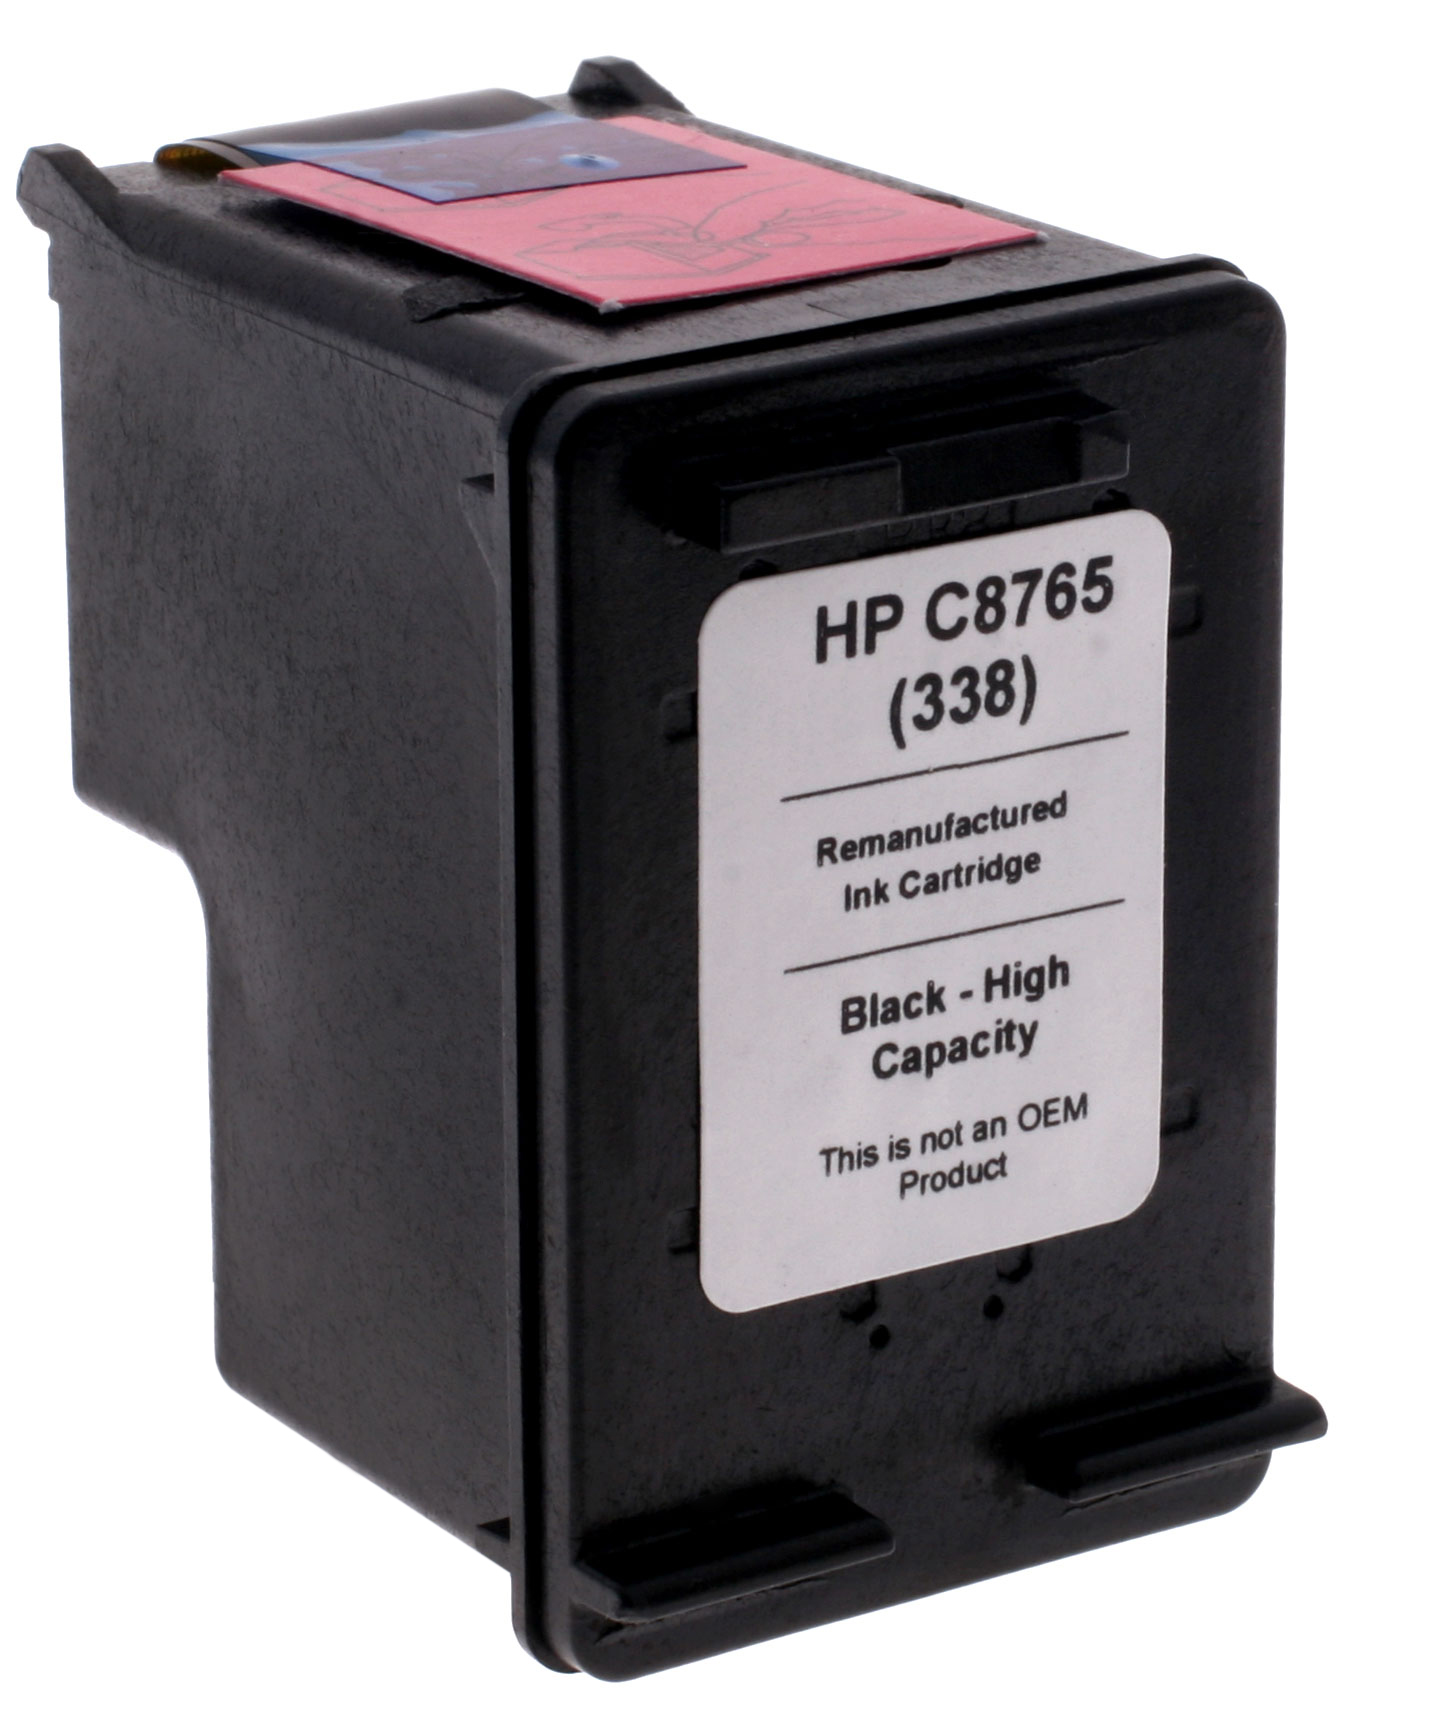 7dayshop Remanufactured HP C8765EE Black Inkjet  Print Cartridge (No.338)